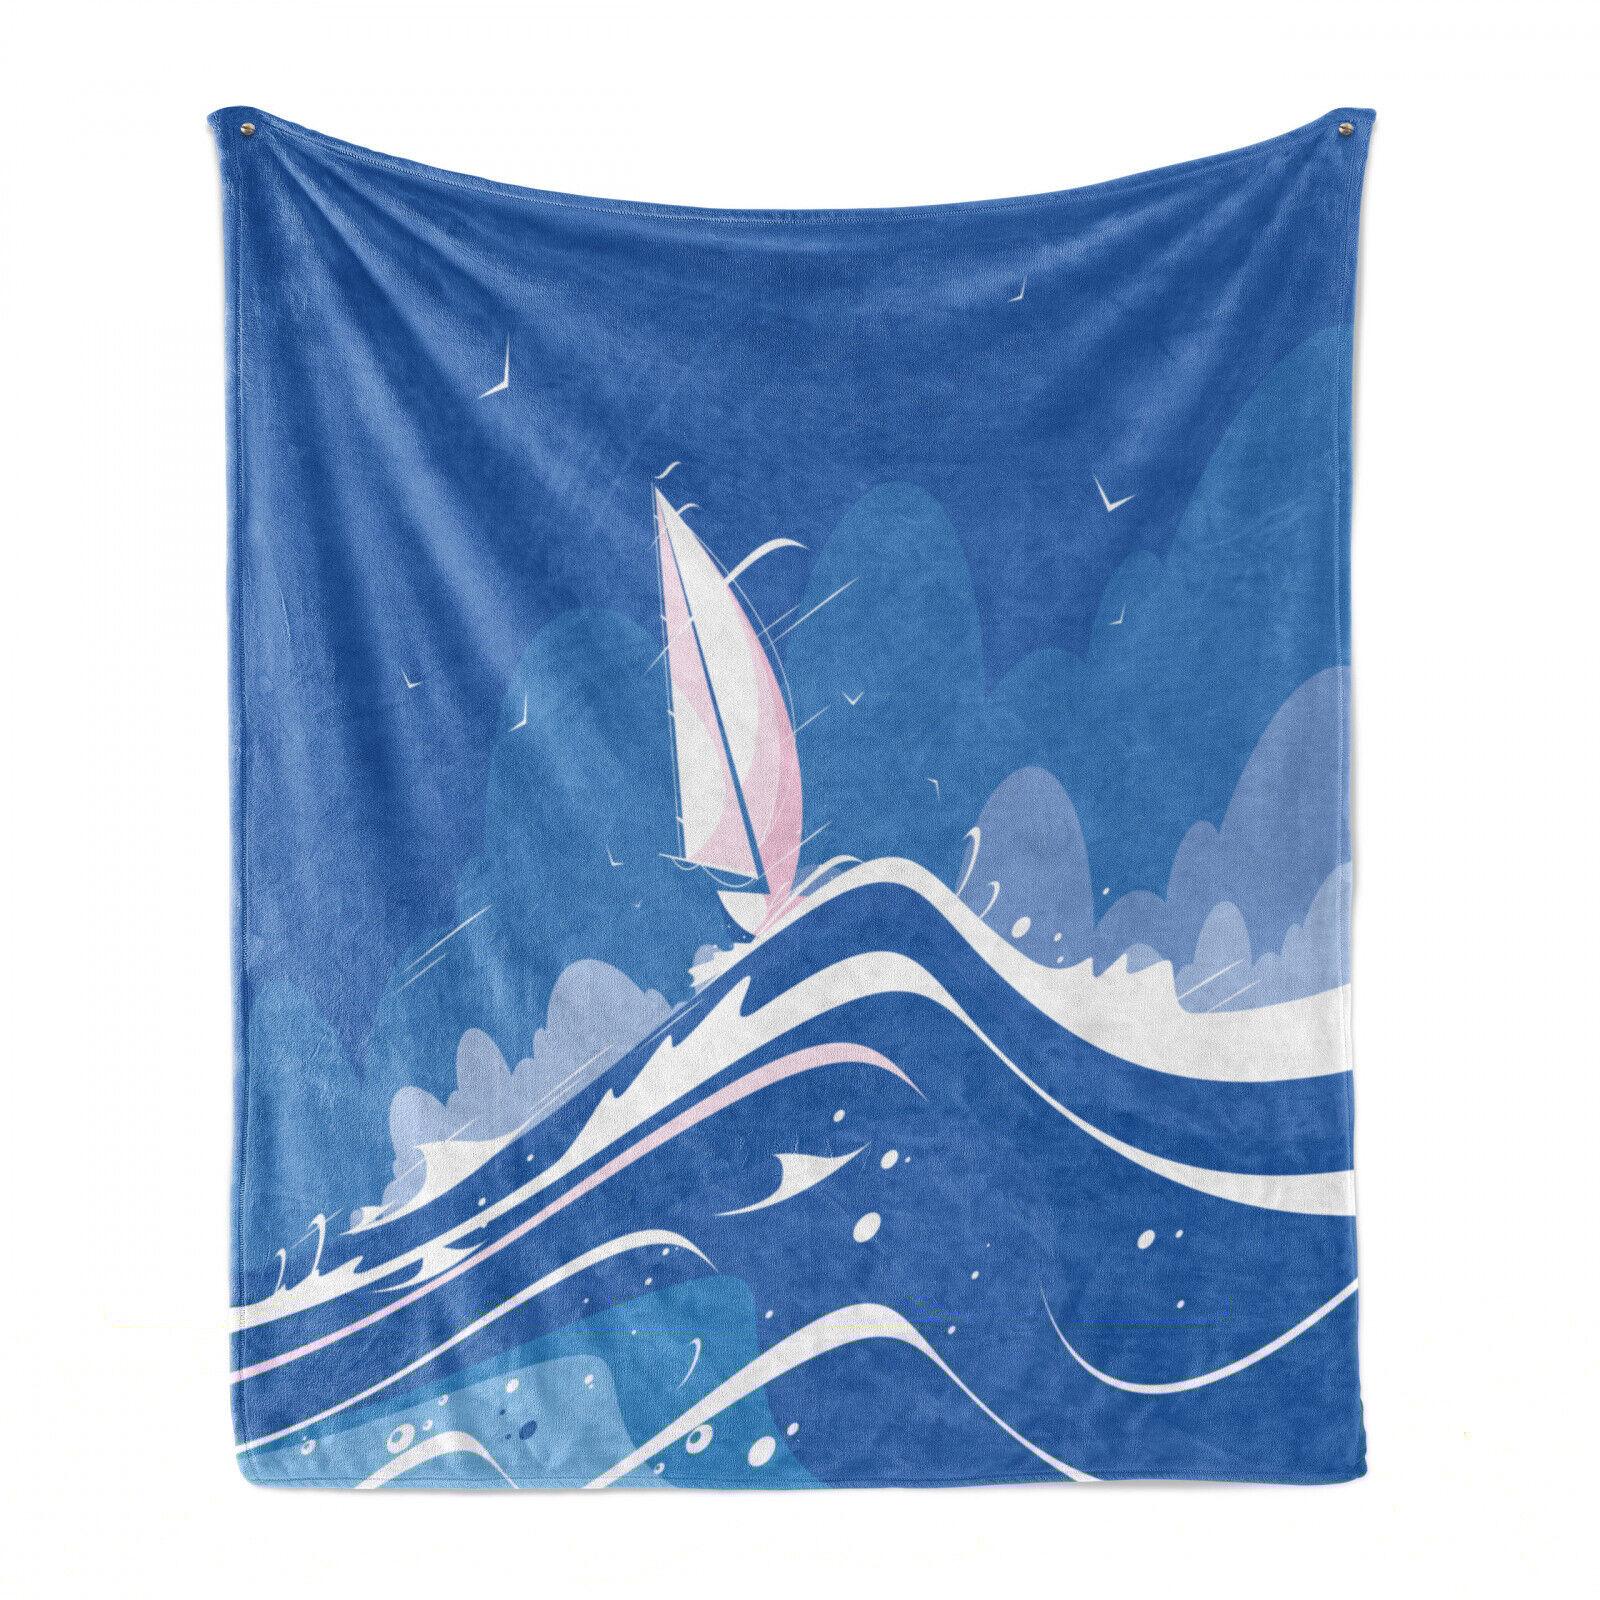 blau Wasser Weich Flanell Fleece Decke Wolken Möwen Boot